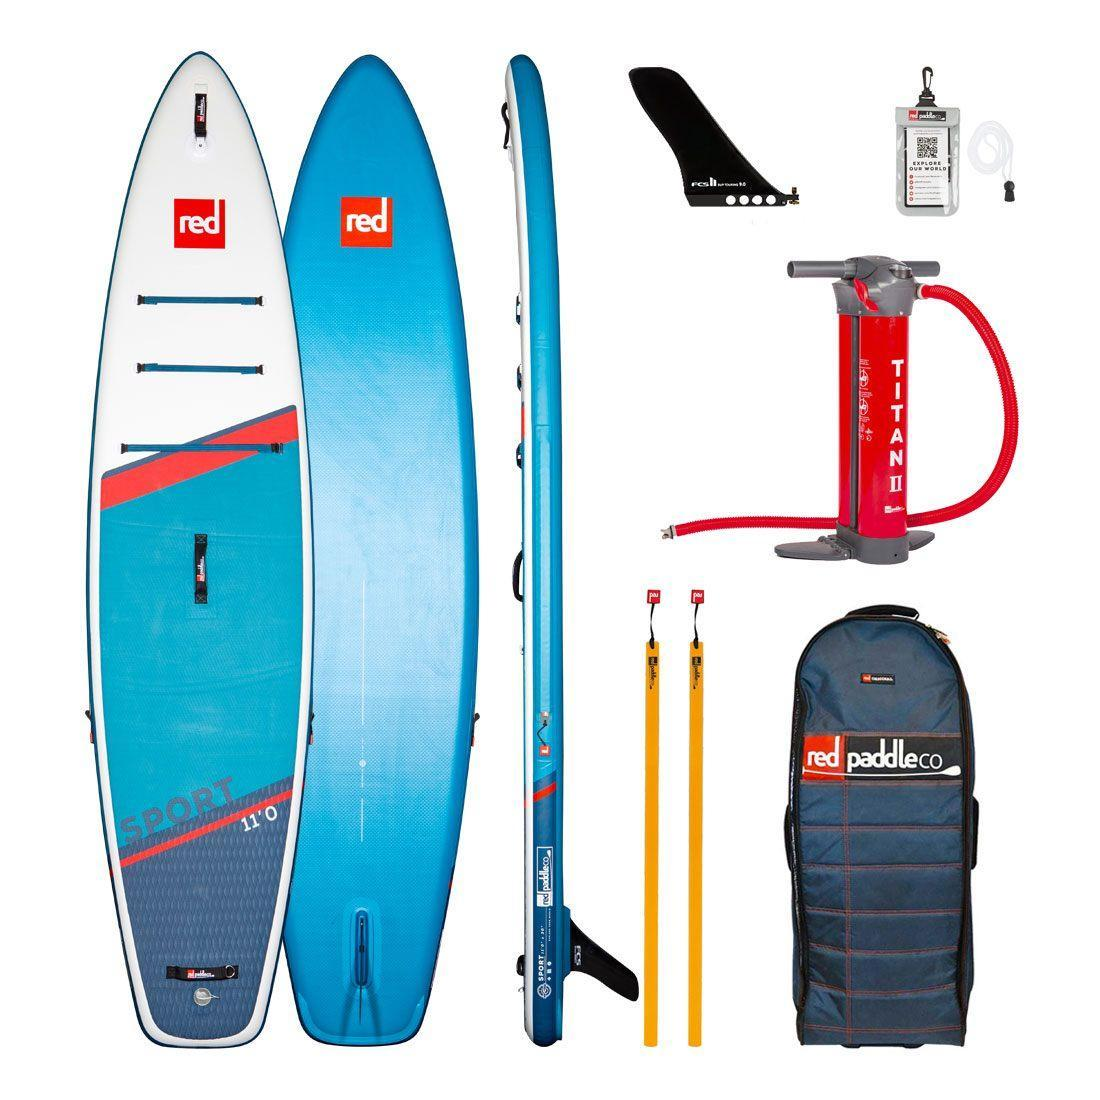 "Сапборд Red Paddle Co Sport 11'3"" x 32"" 2021 - надувна дошка для САП серфінгу, sup board"